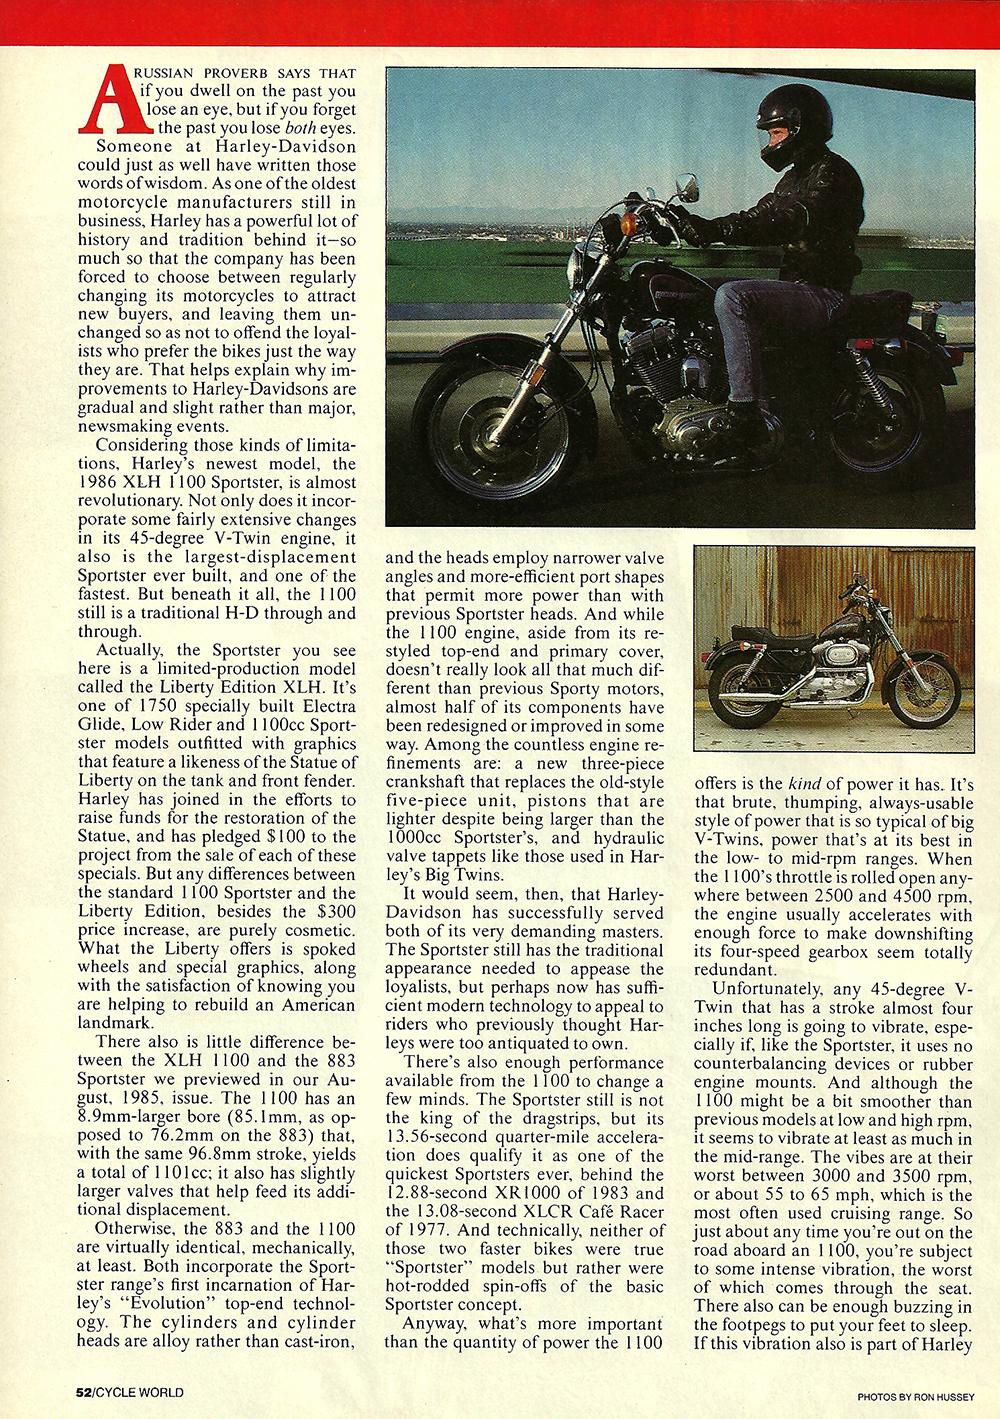 1985 Harley Davidson XLH 1100 Sportster road test 03.jpg